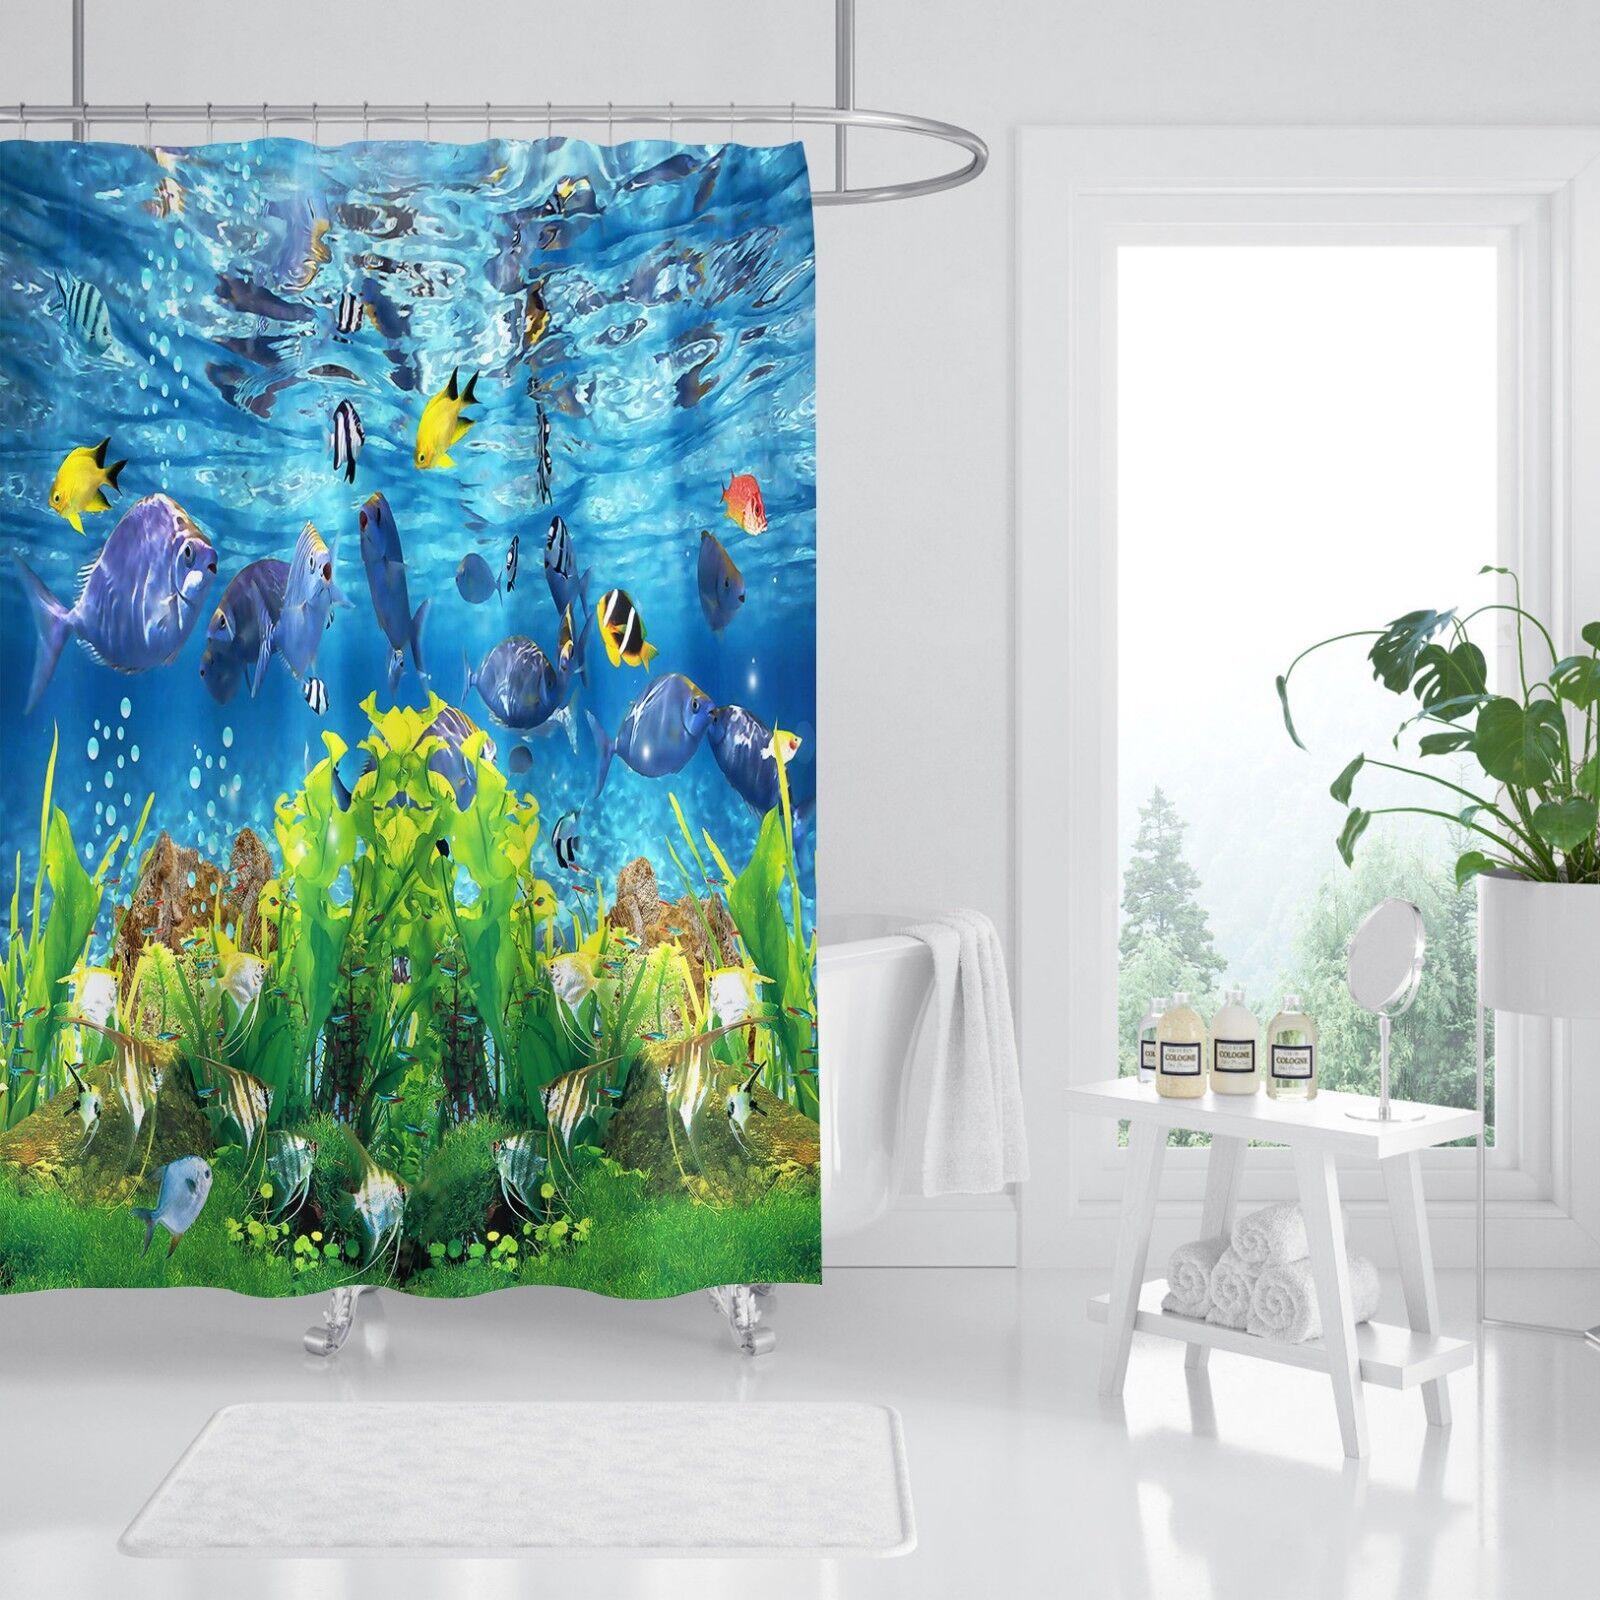 3D Sea Coral 4 Shower Curtain Waterproof Fiber Bathroom Home Windows Toilet